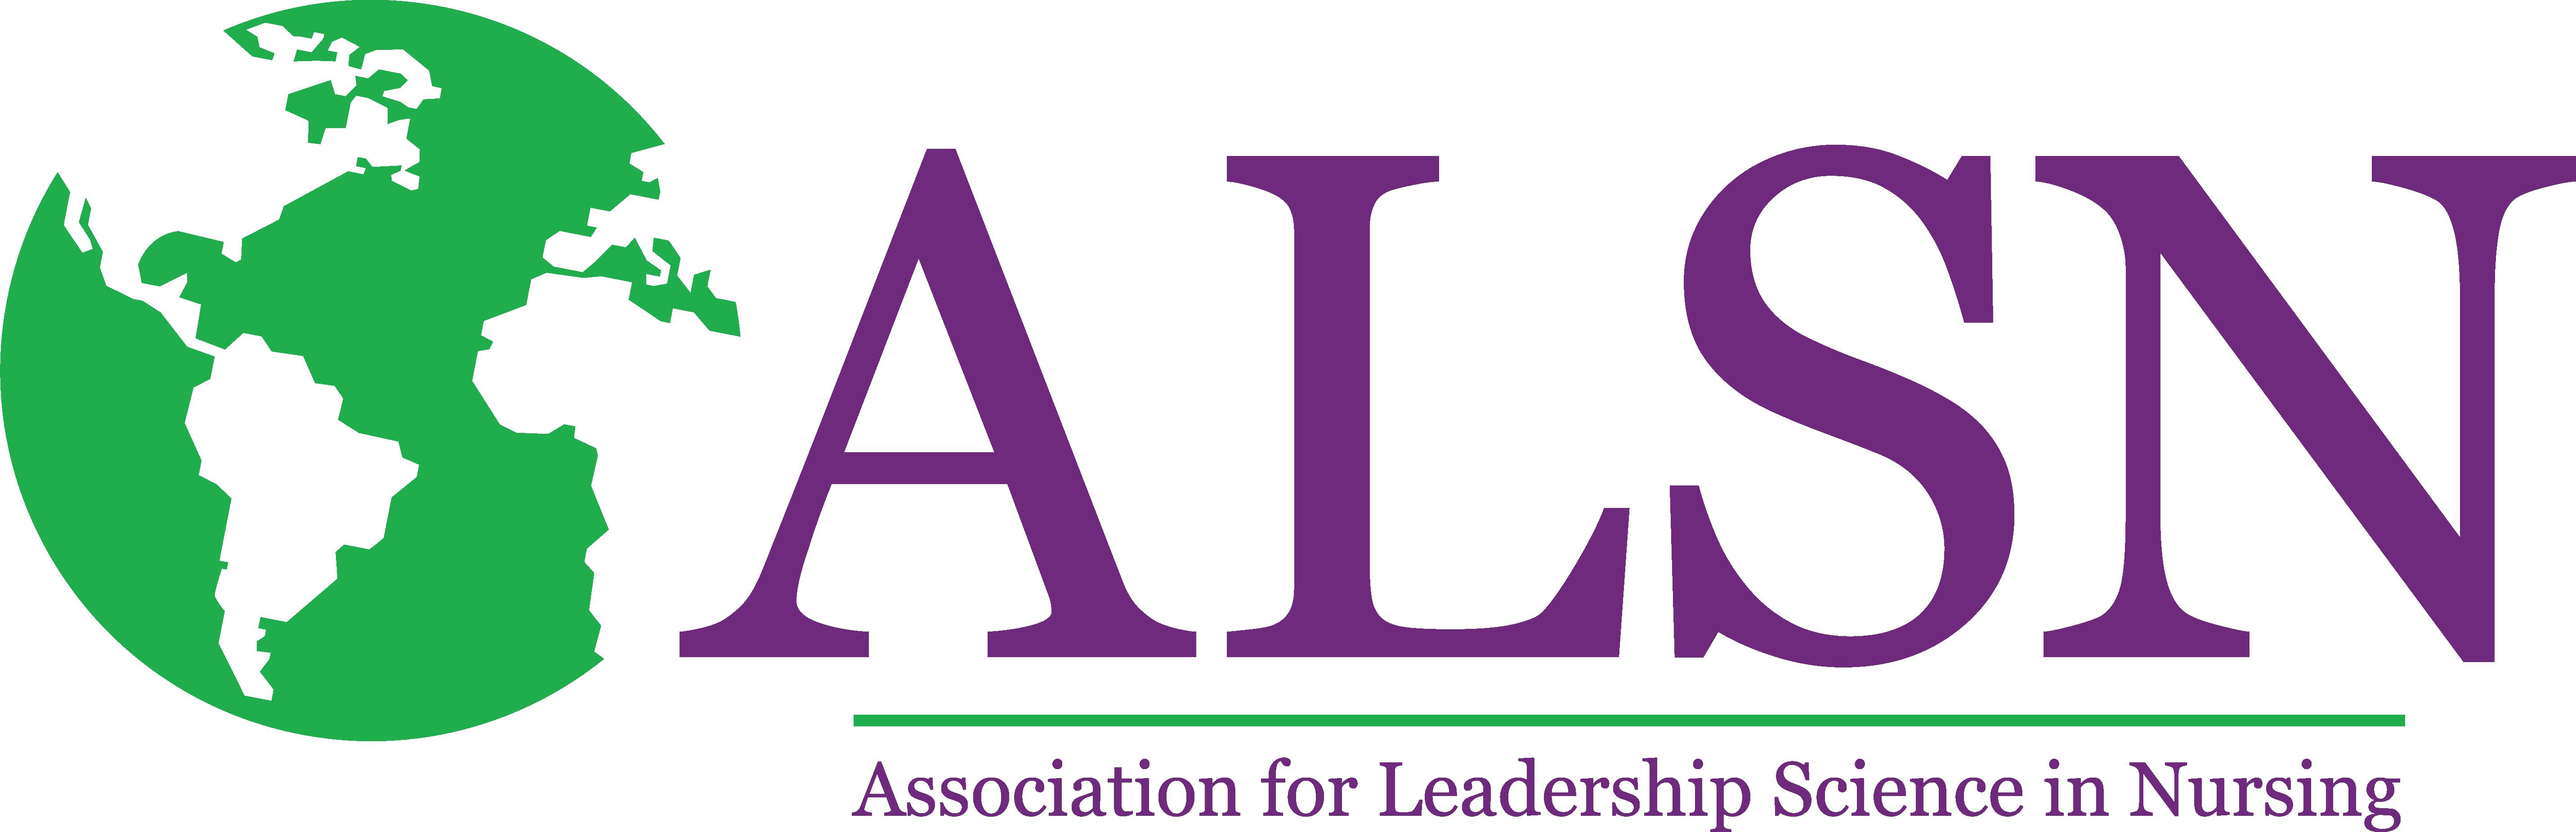 Association for Leadership Science in Nursing